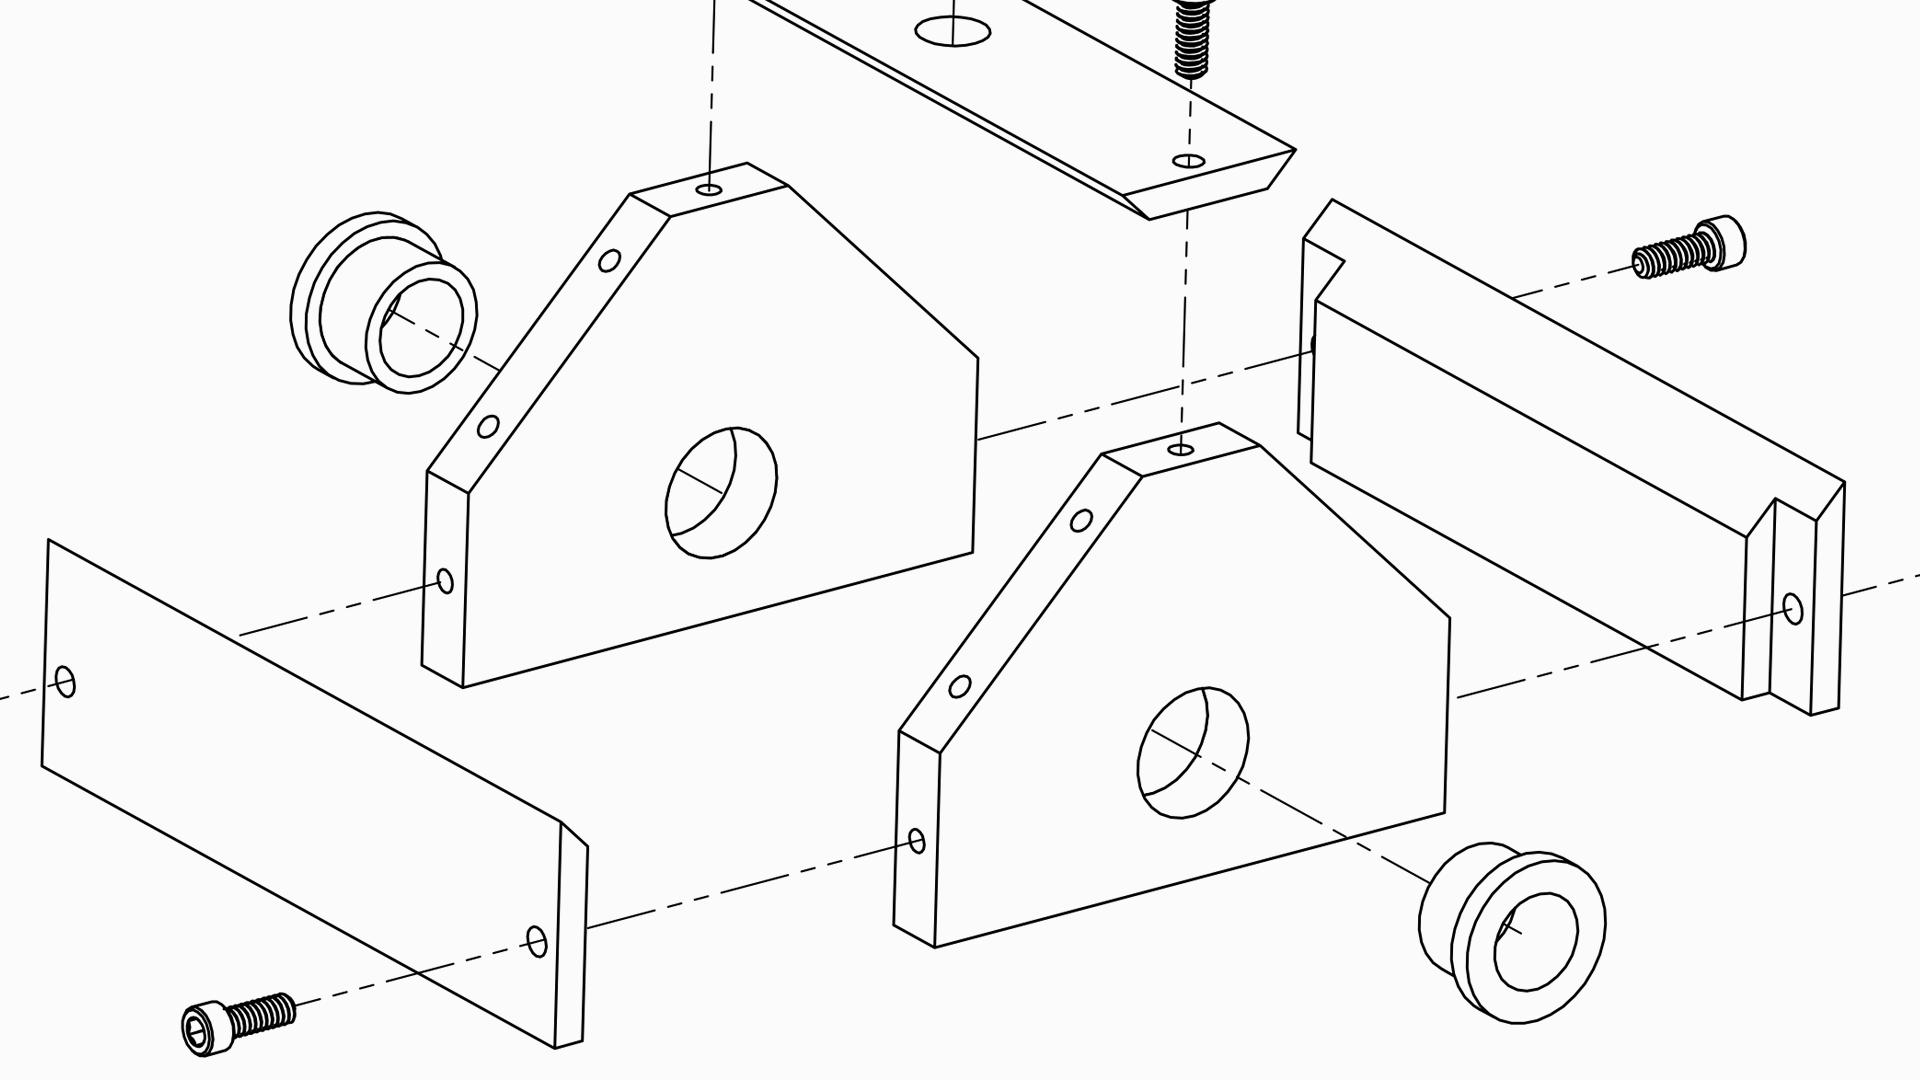 Engineering Tools Drawing At Getdrawings